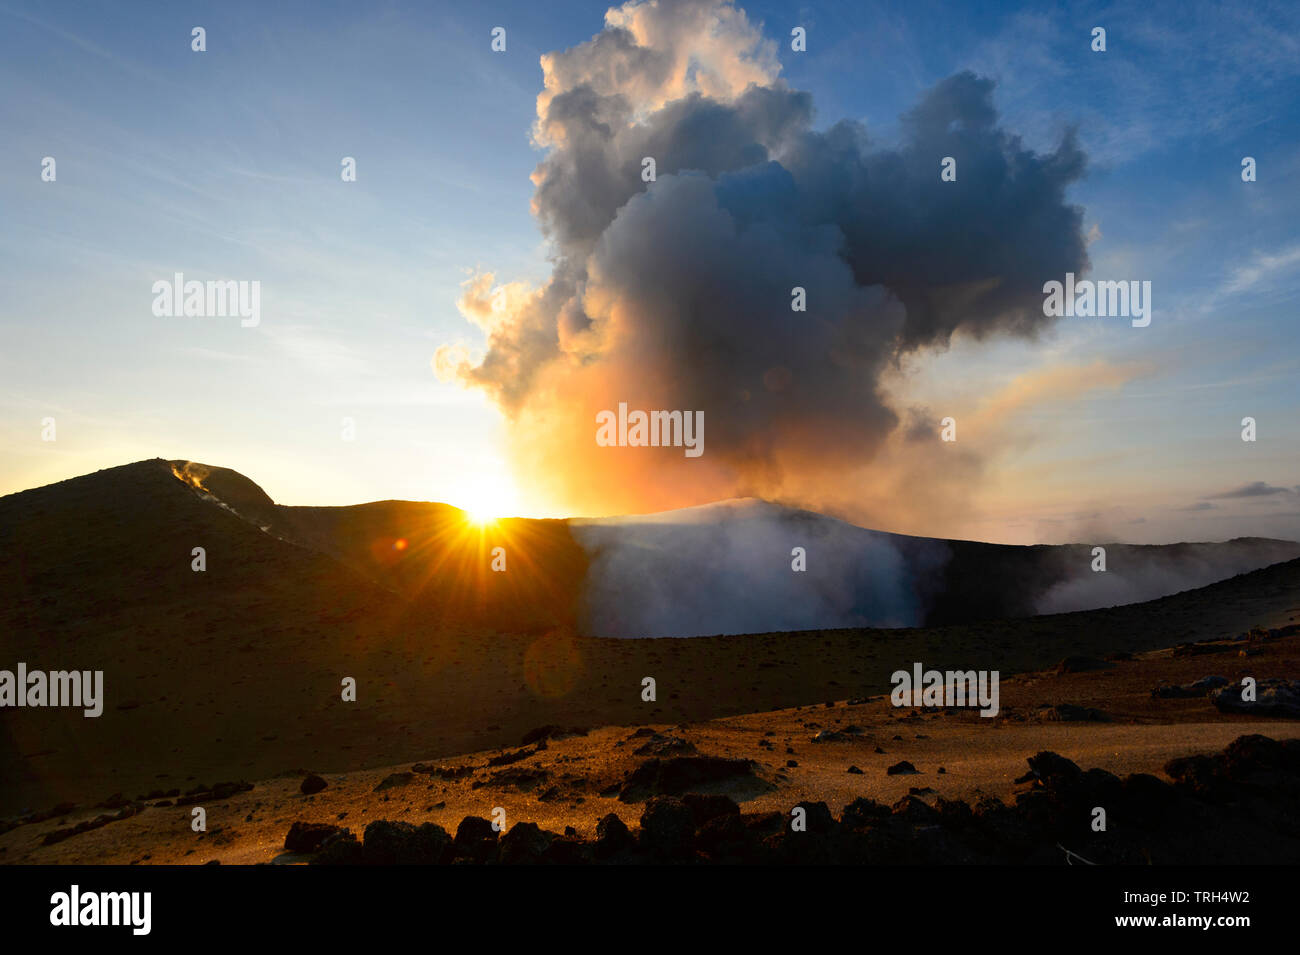 Erupting Mt Yasur Volcano at sunset, Tanna Island, Vanuatu - Stock Image